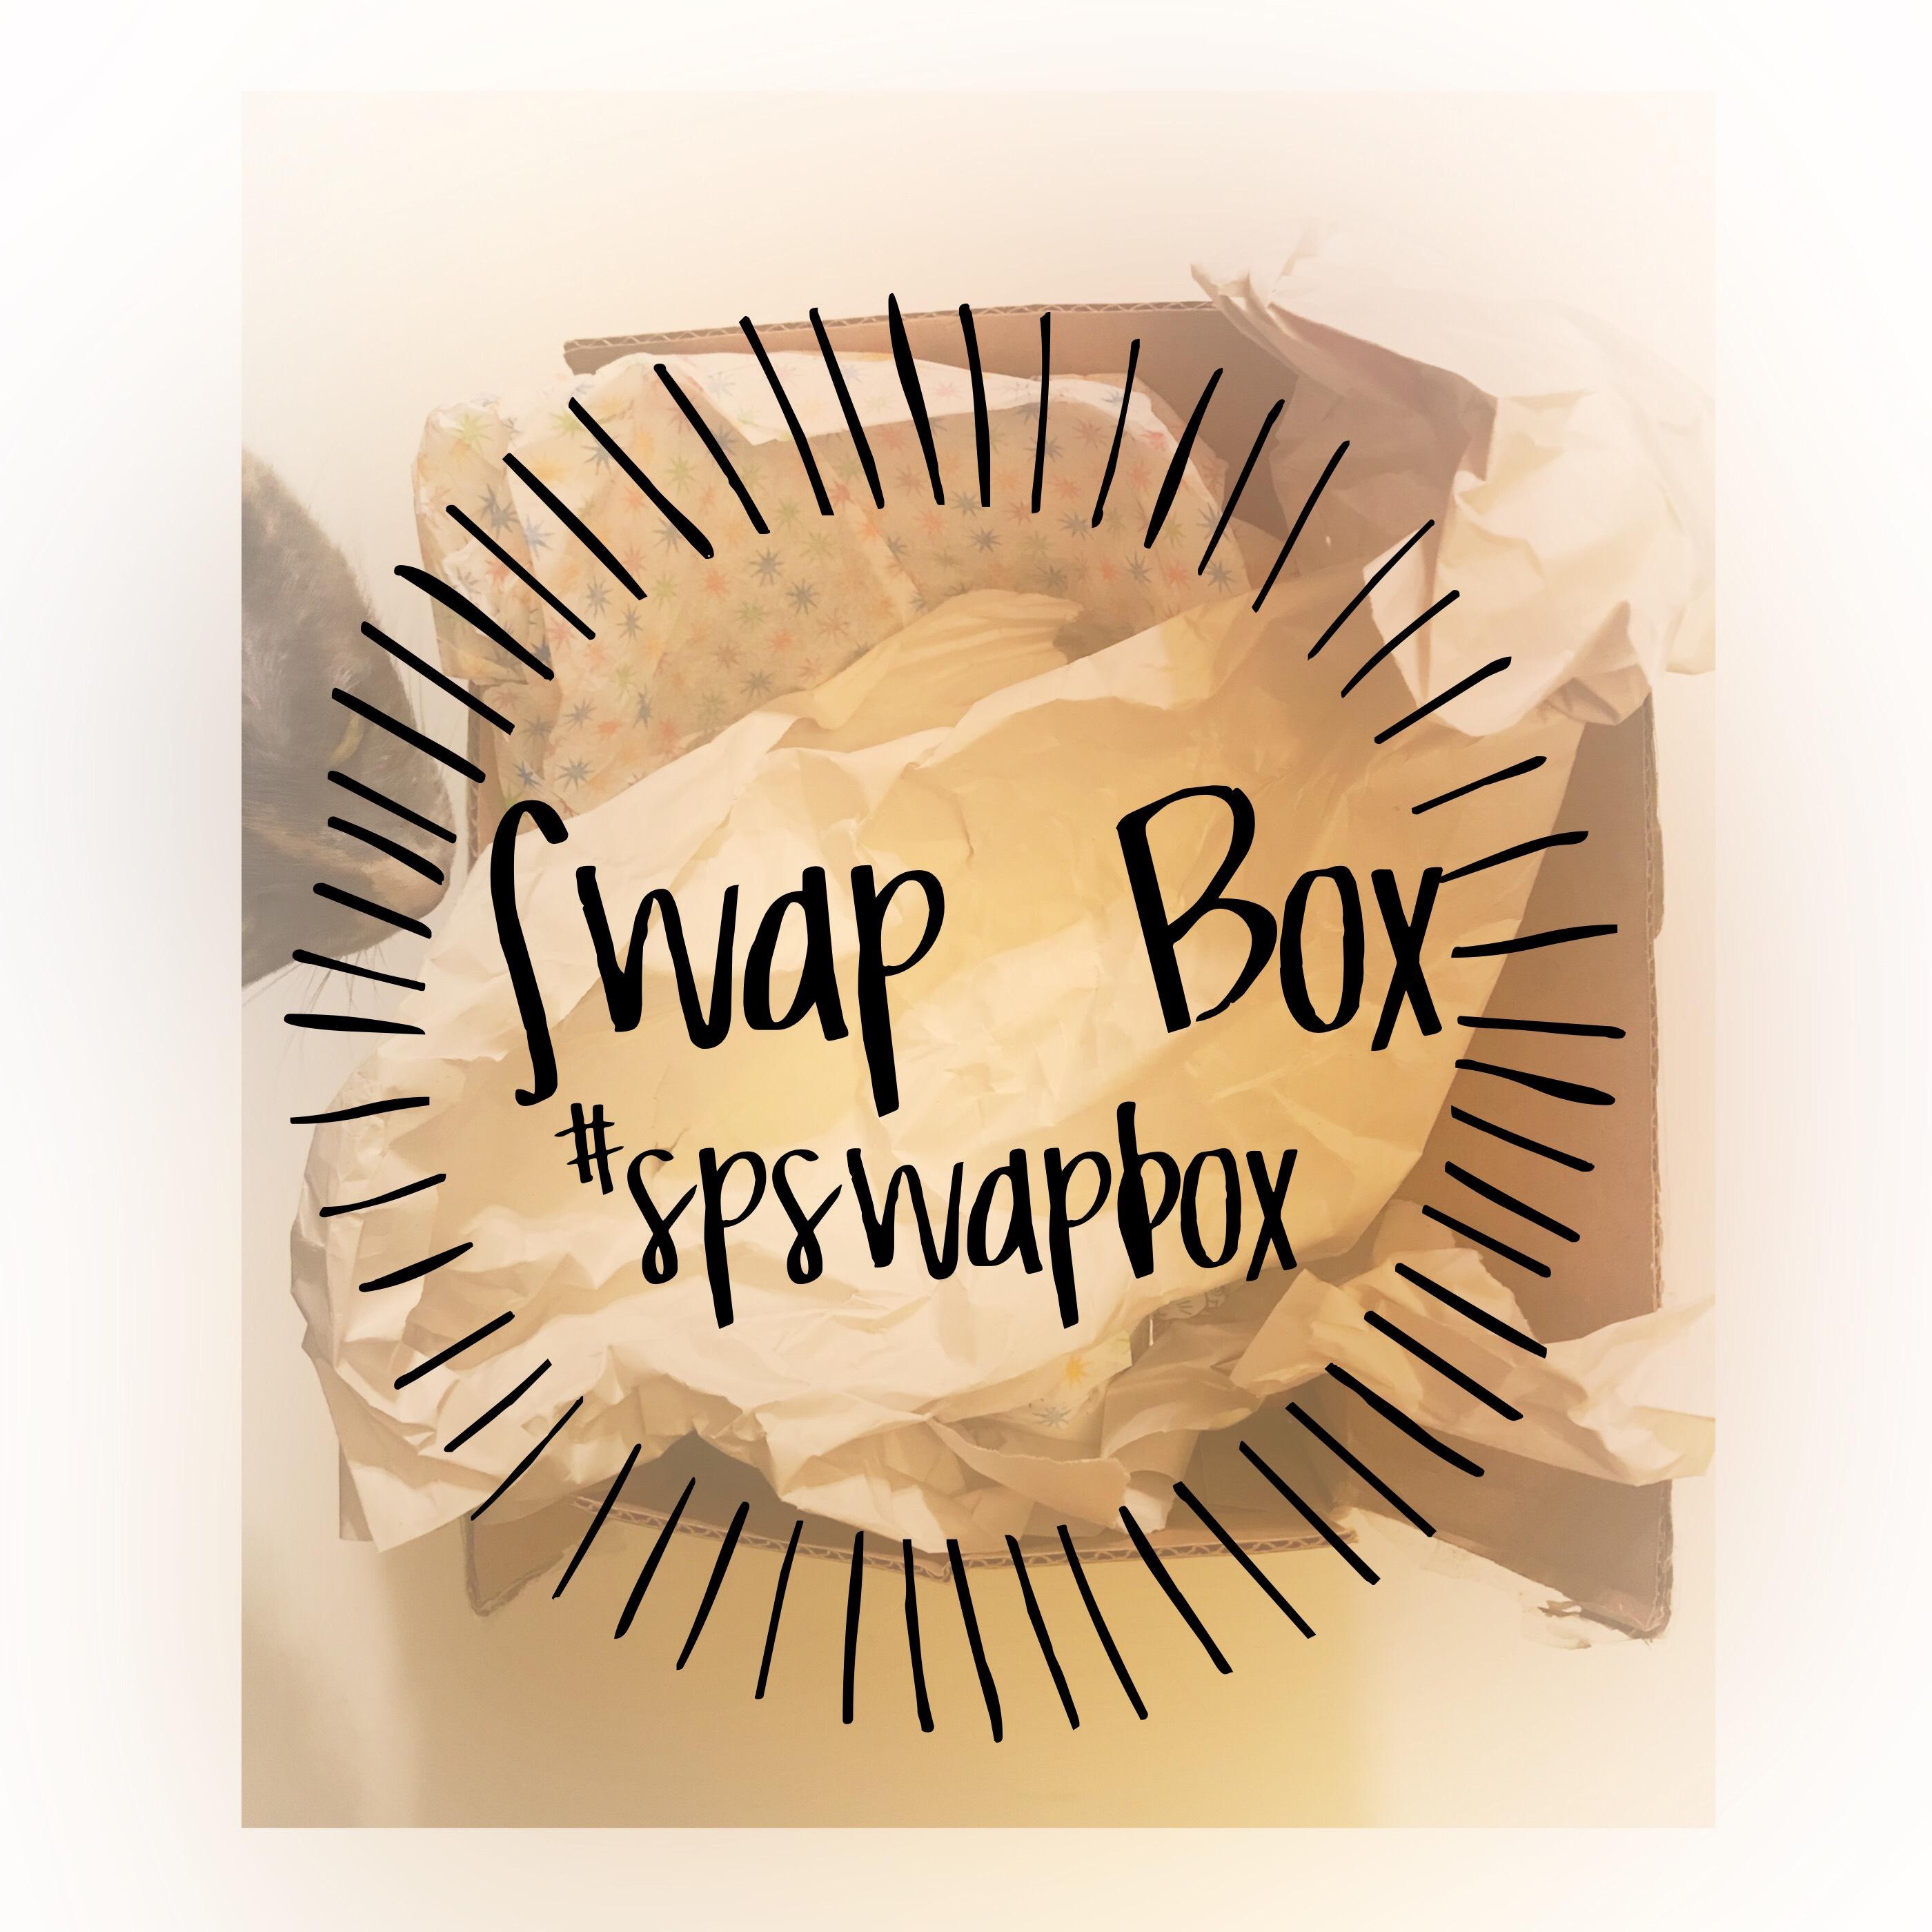 #SpSwapbox Prizes